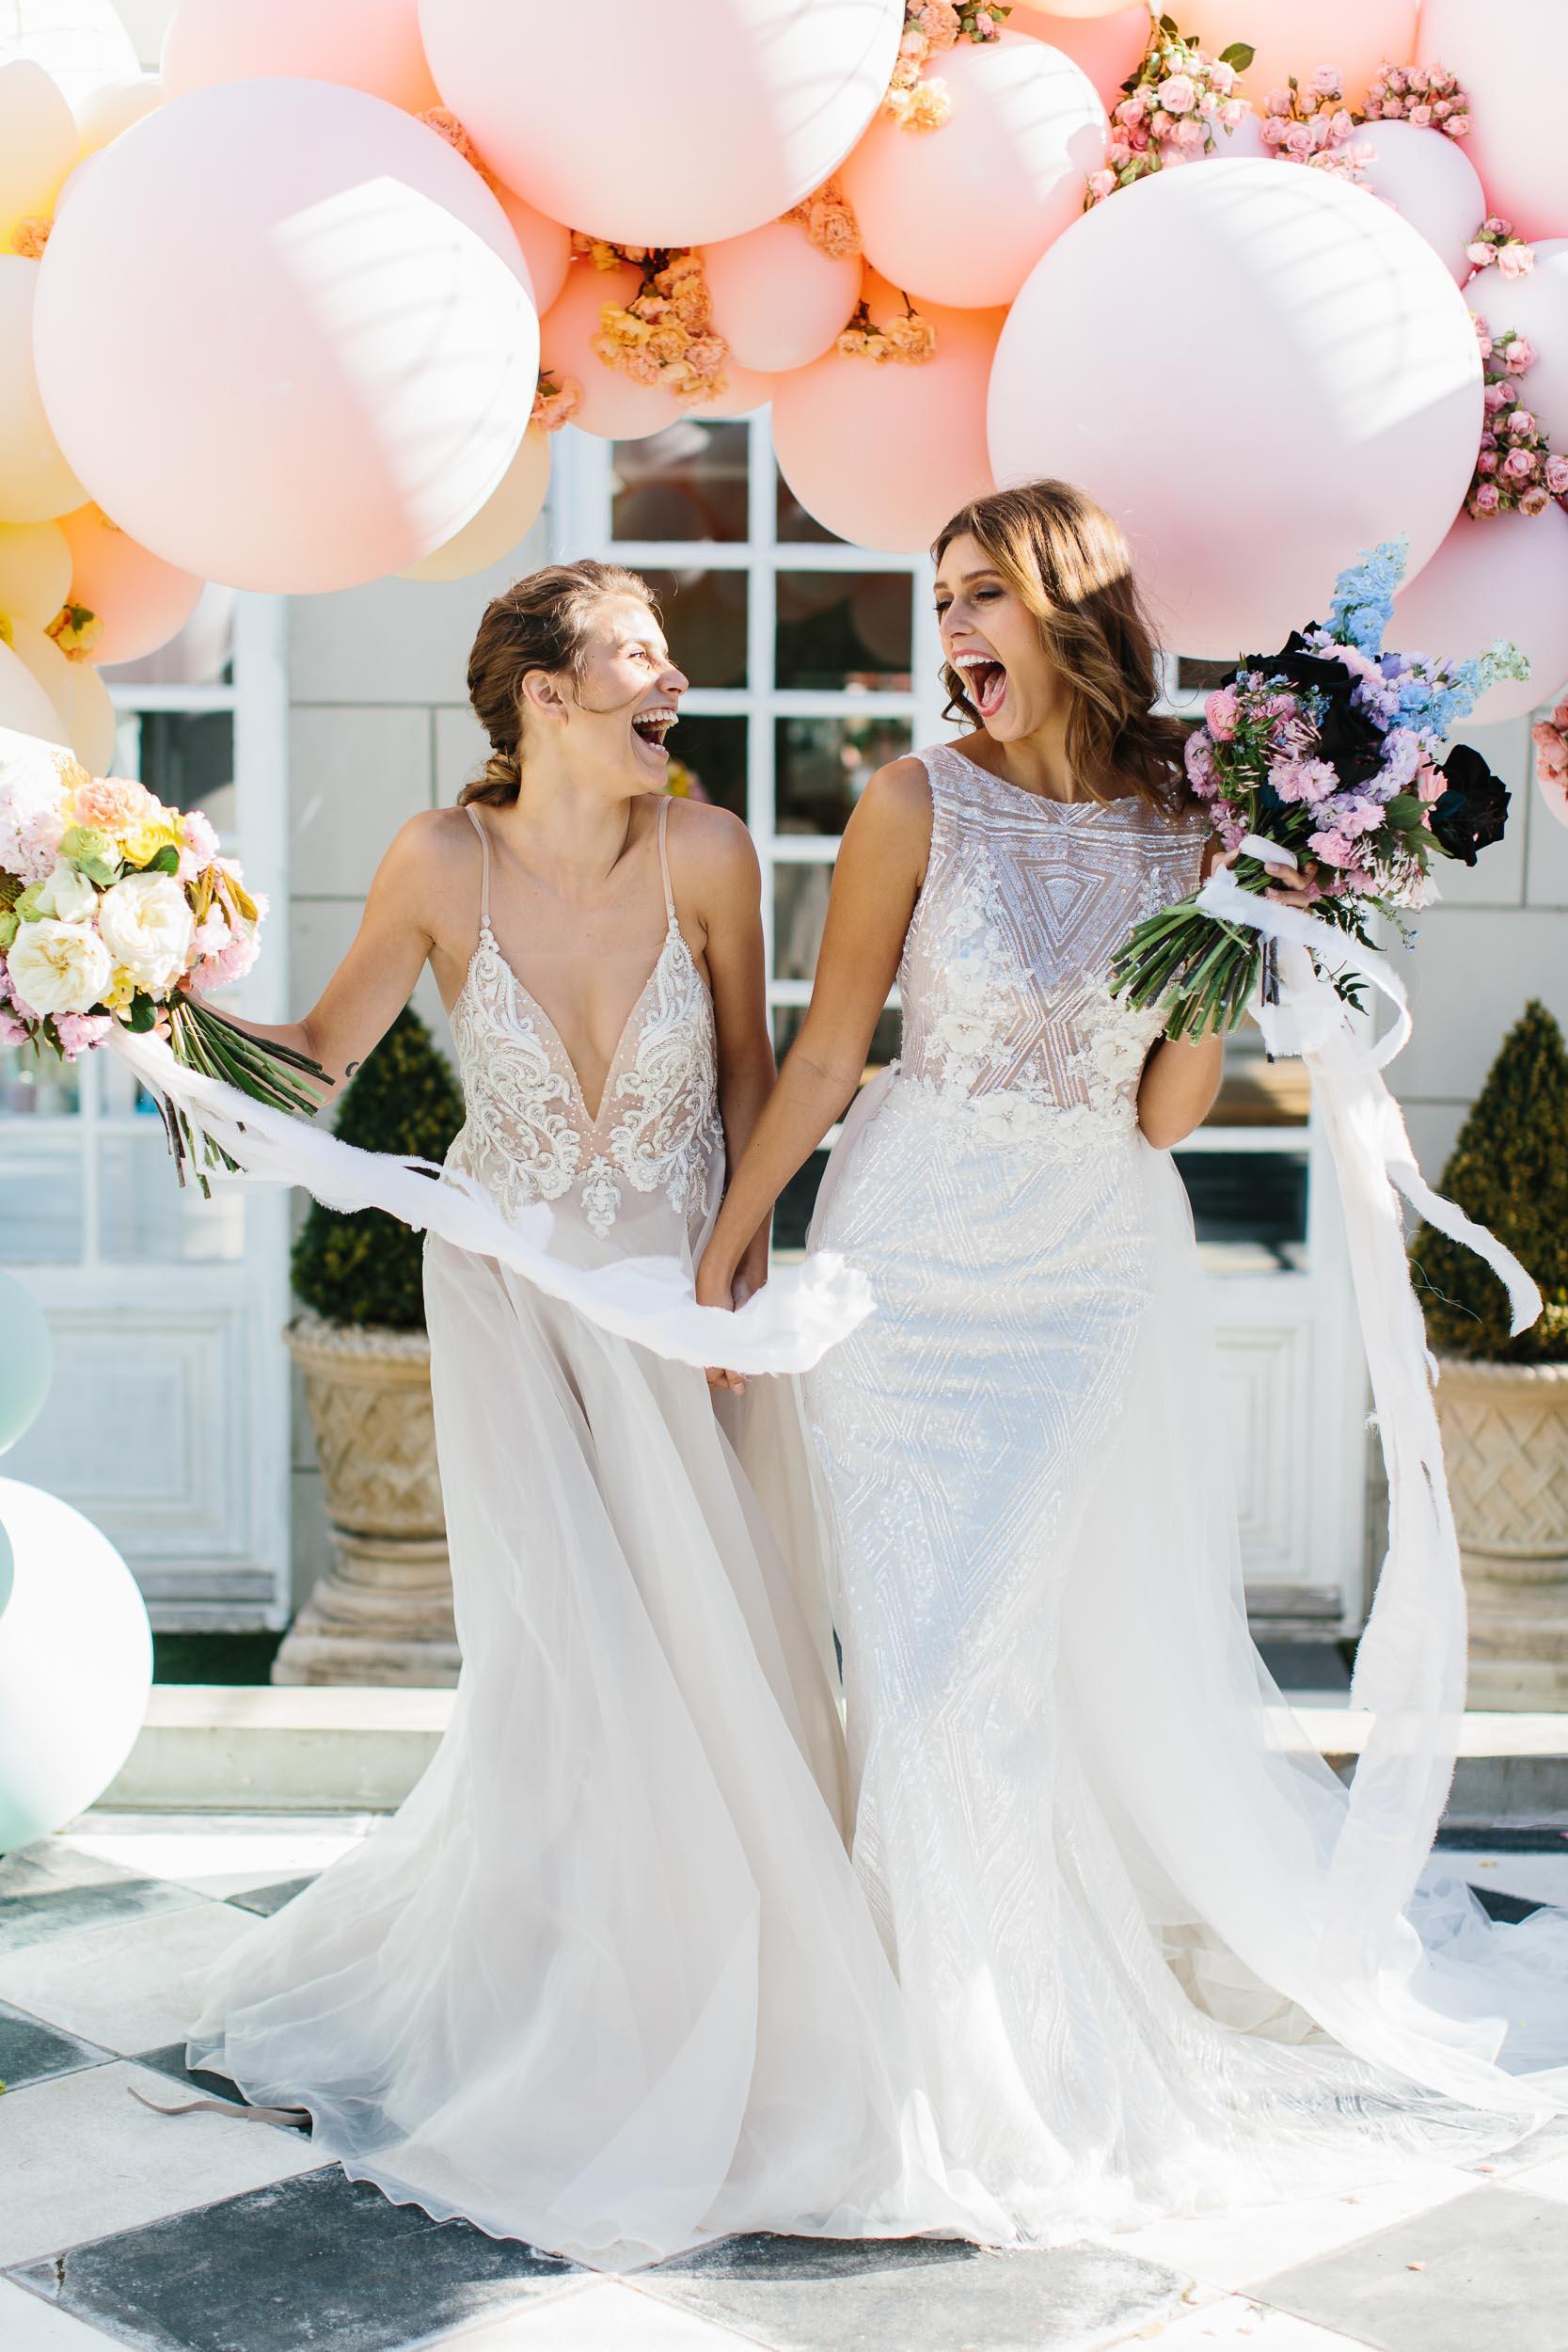 Same Sex Wedding Ceremony Photo | Wedding Photography by Kas Richards